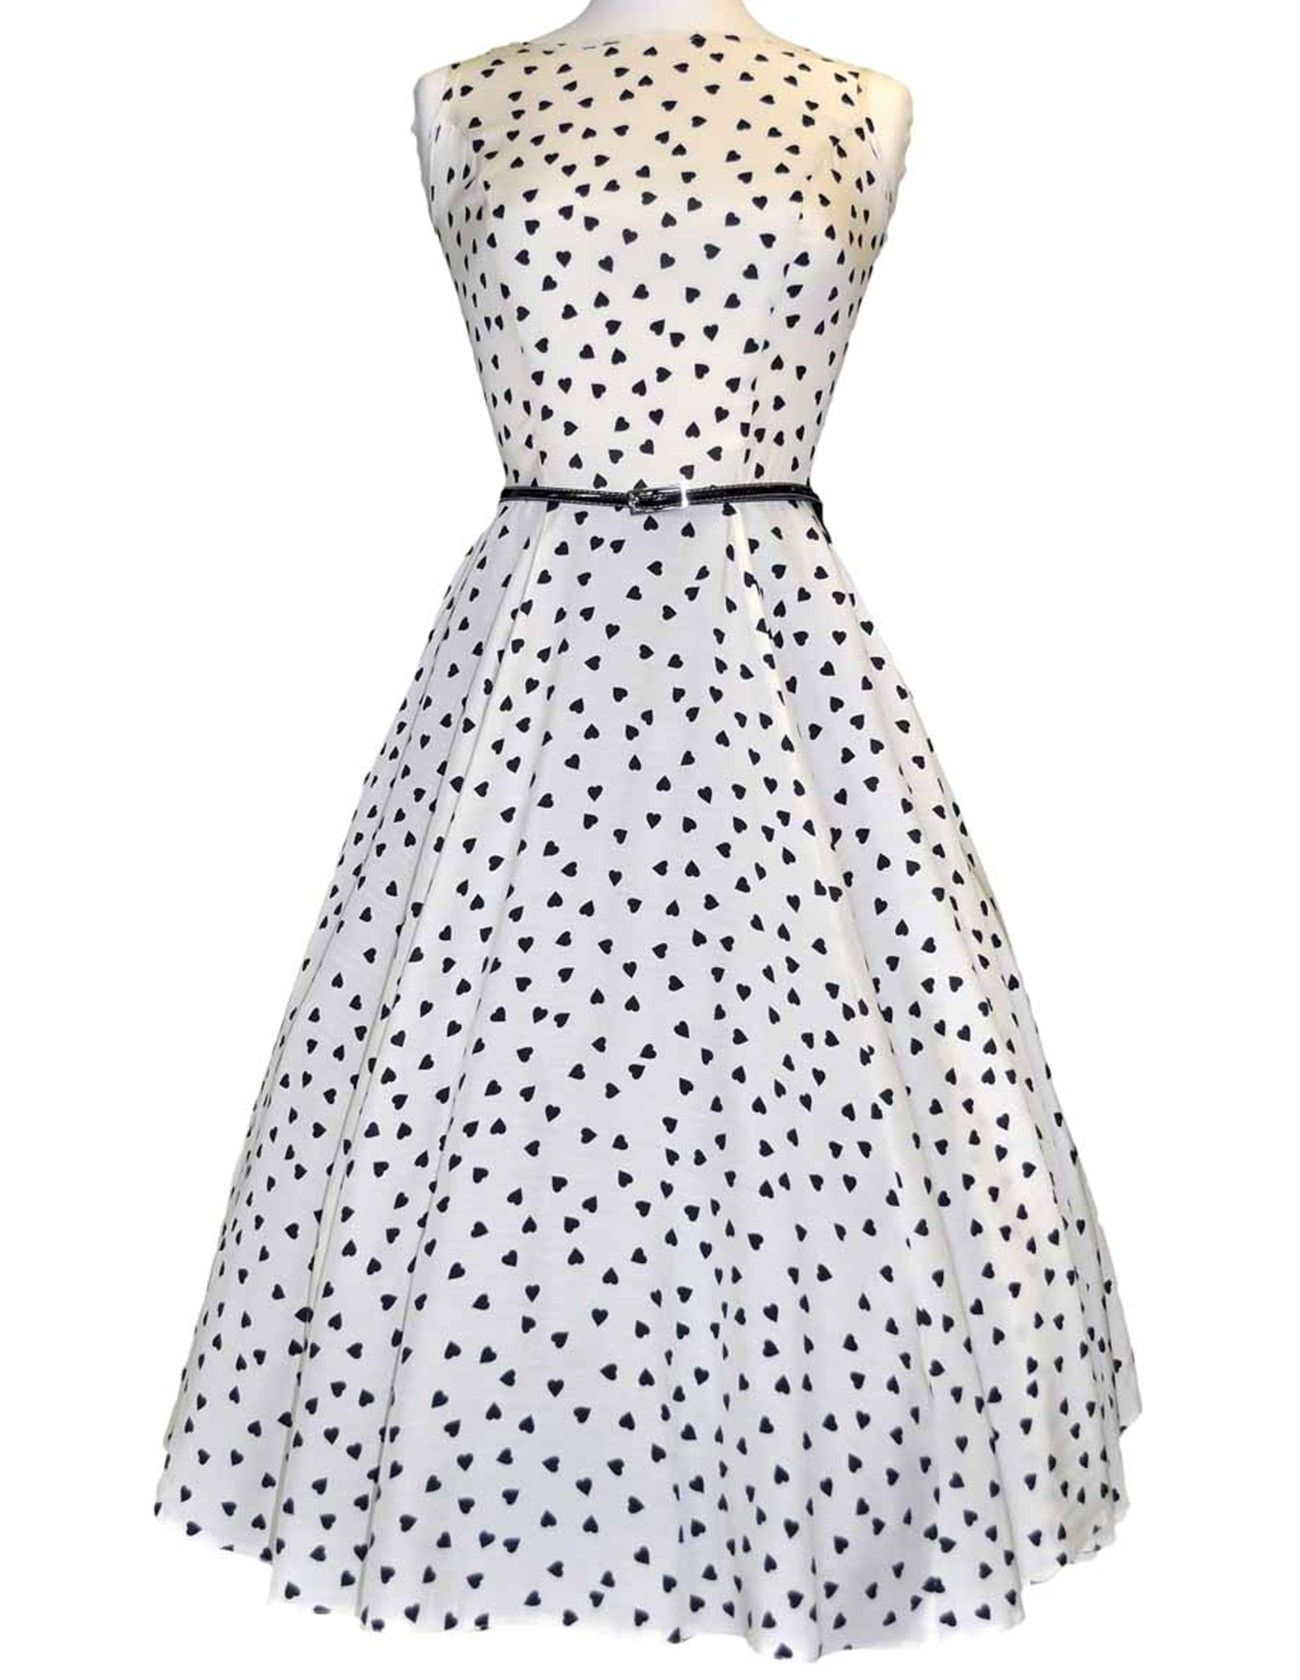 Audrey Hepburn style dress because everyone needs a little Hepburn